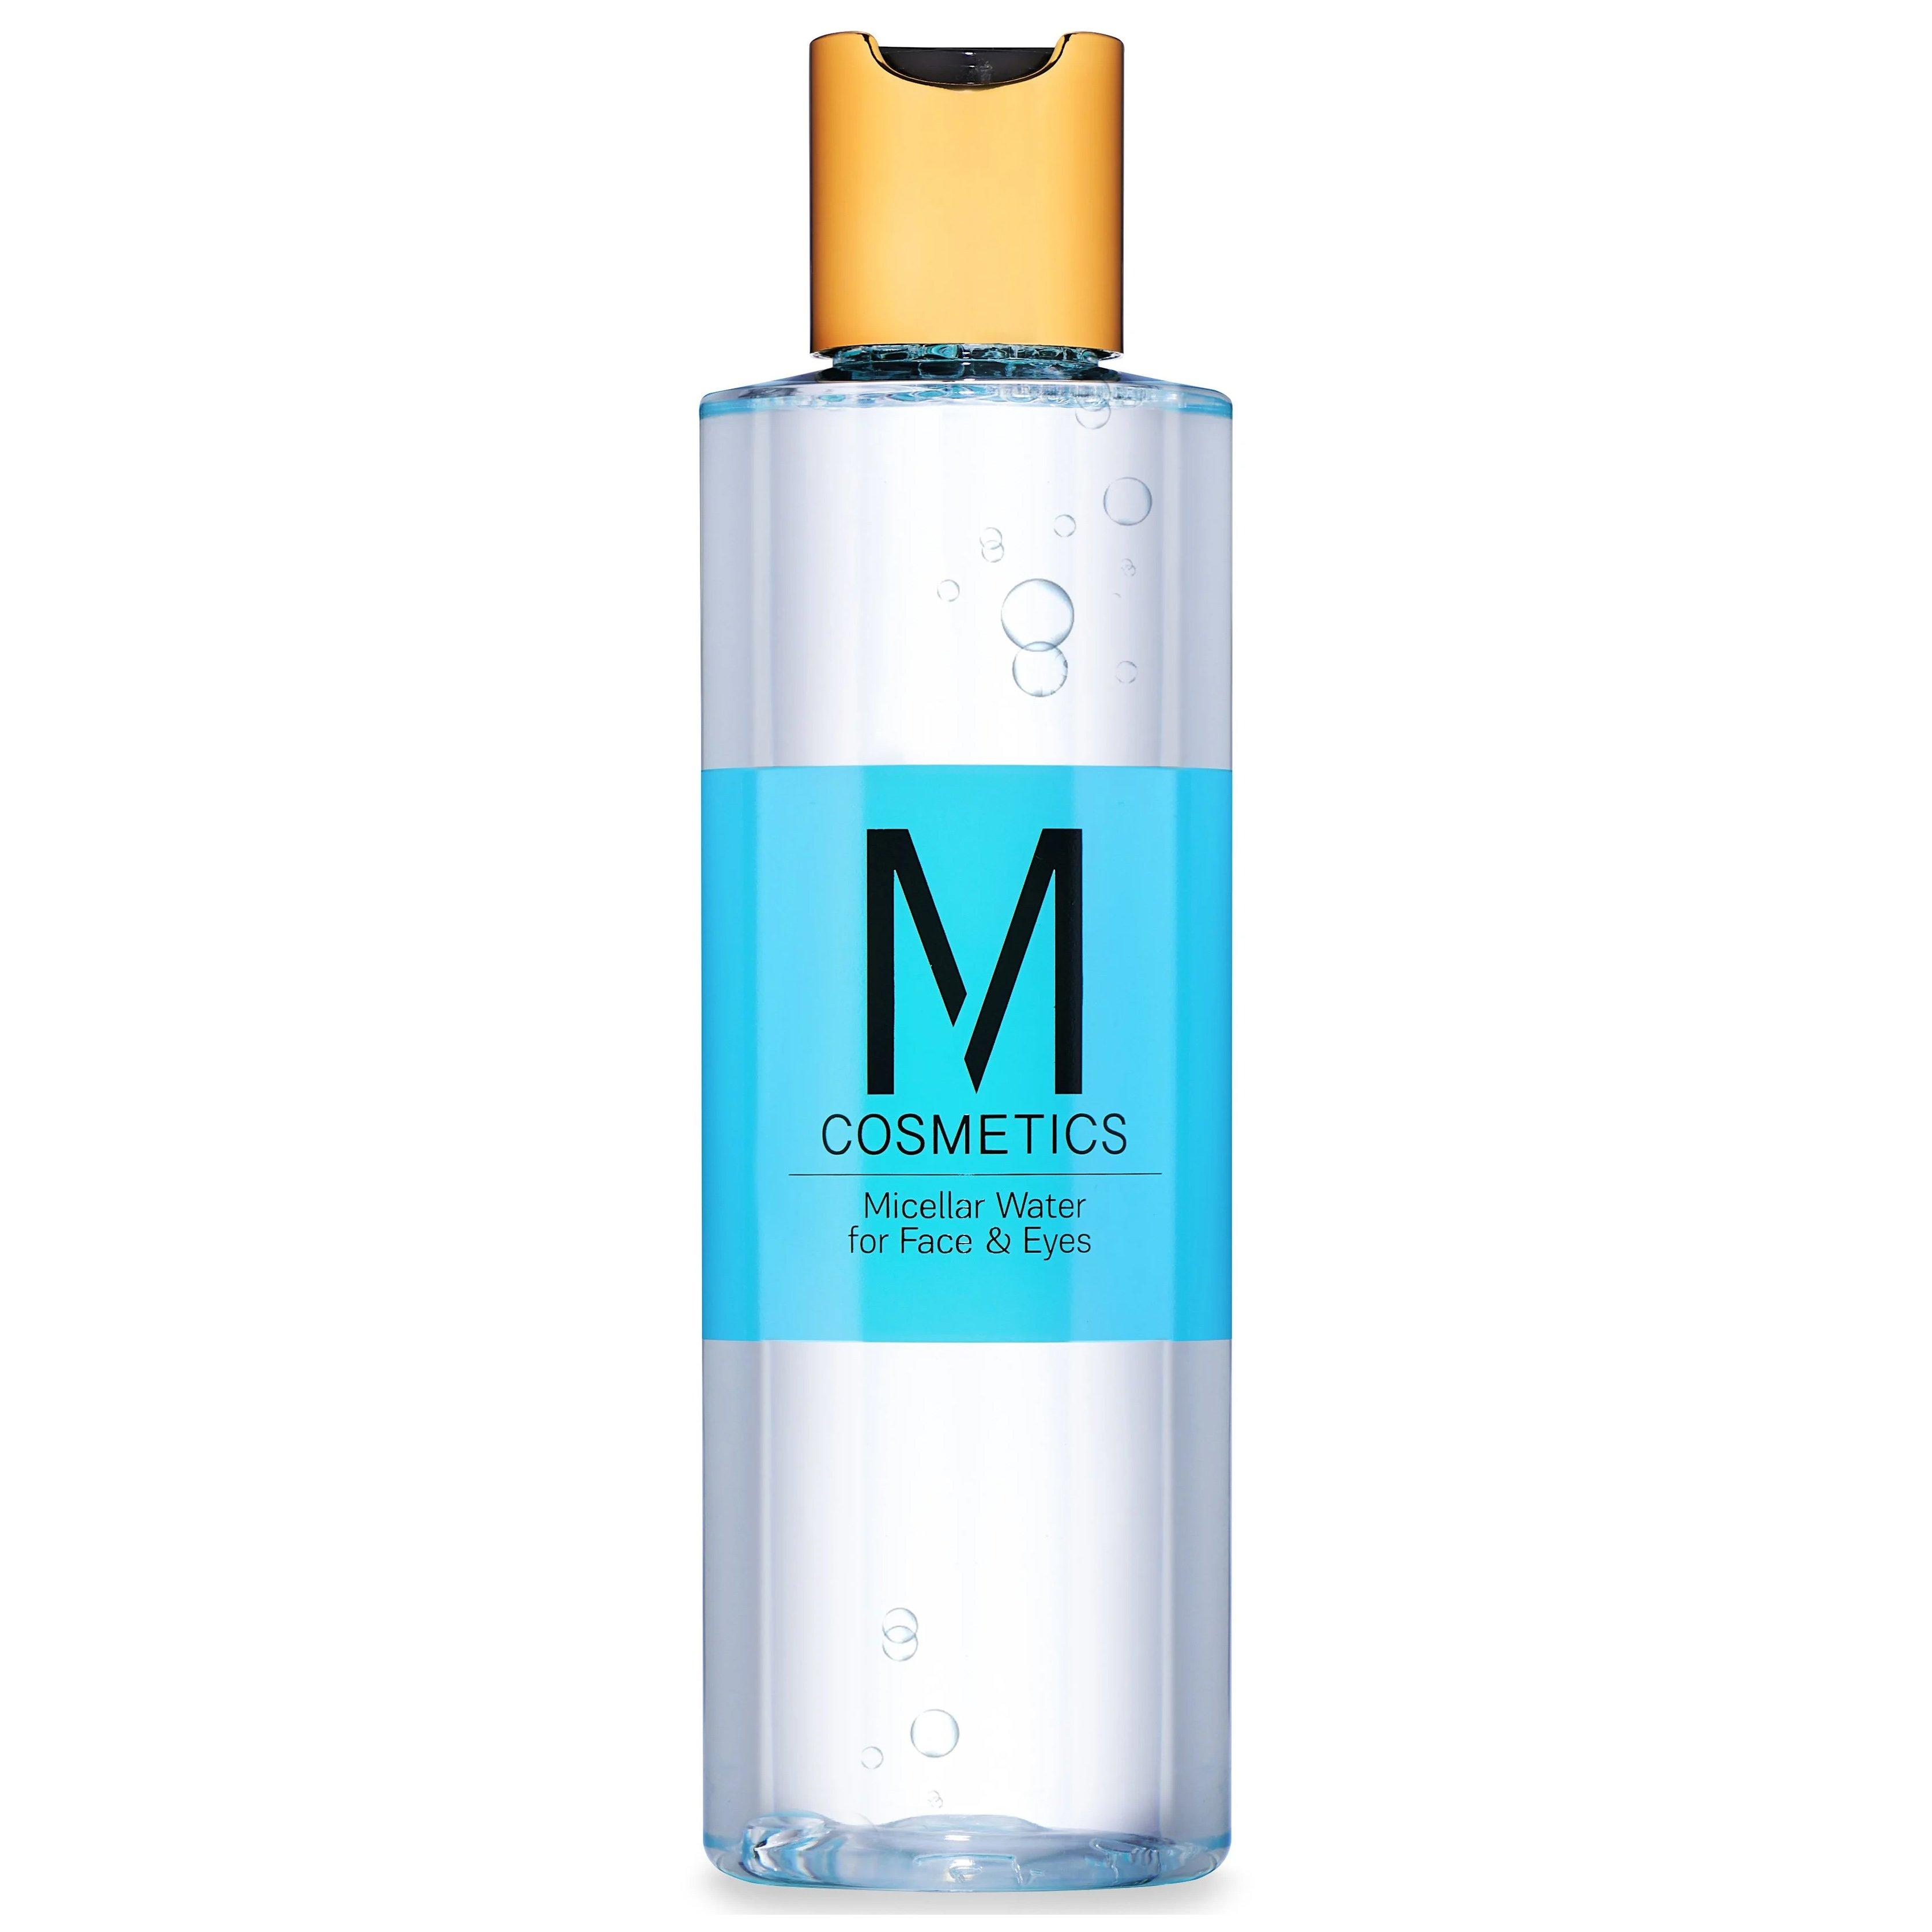 M Cosmetis Micellar Water For Face & Eyes Νερό Καθαρισμού & Ντεμακιγιάζ Προσώπου Ματιών, με Μικυλιακούς Παράγοντες 200ml